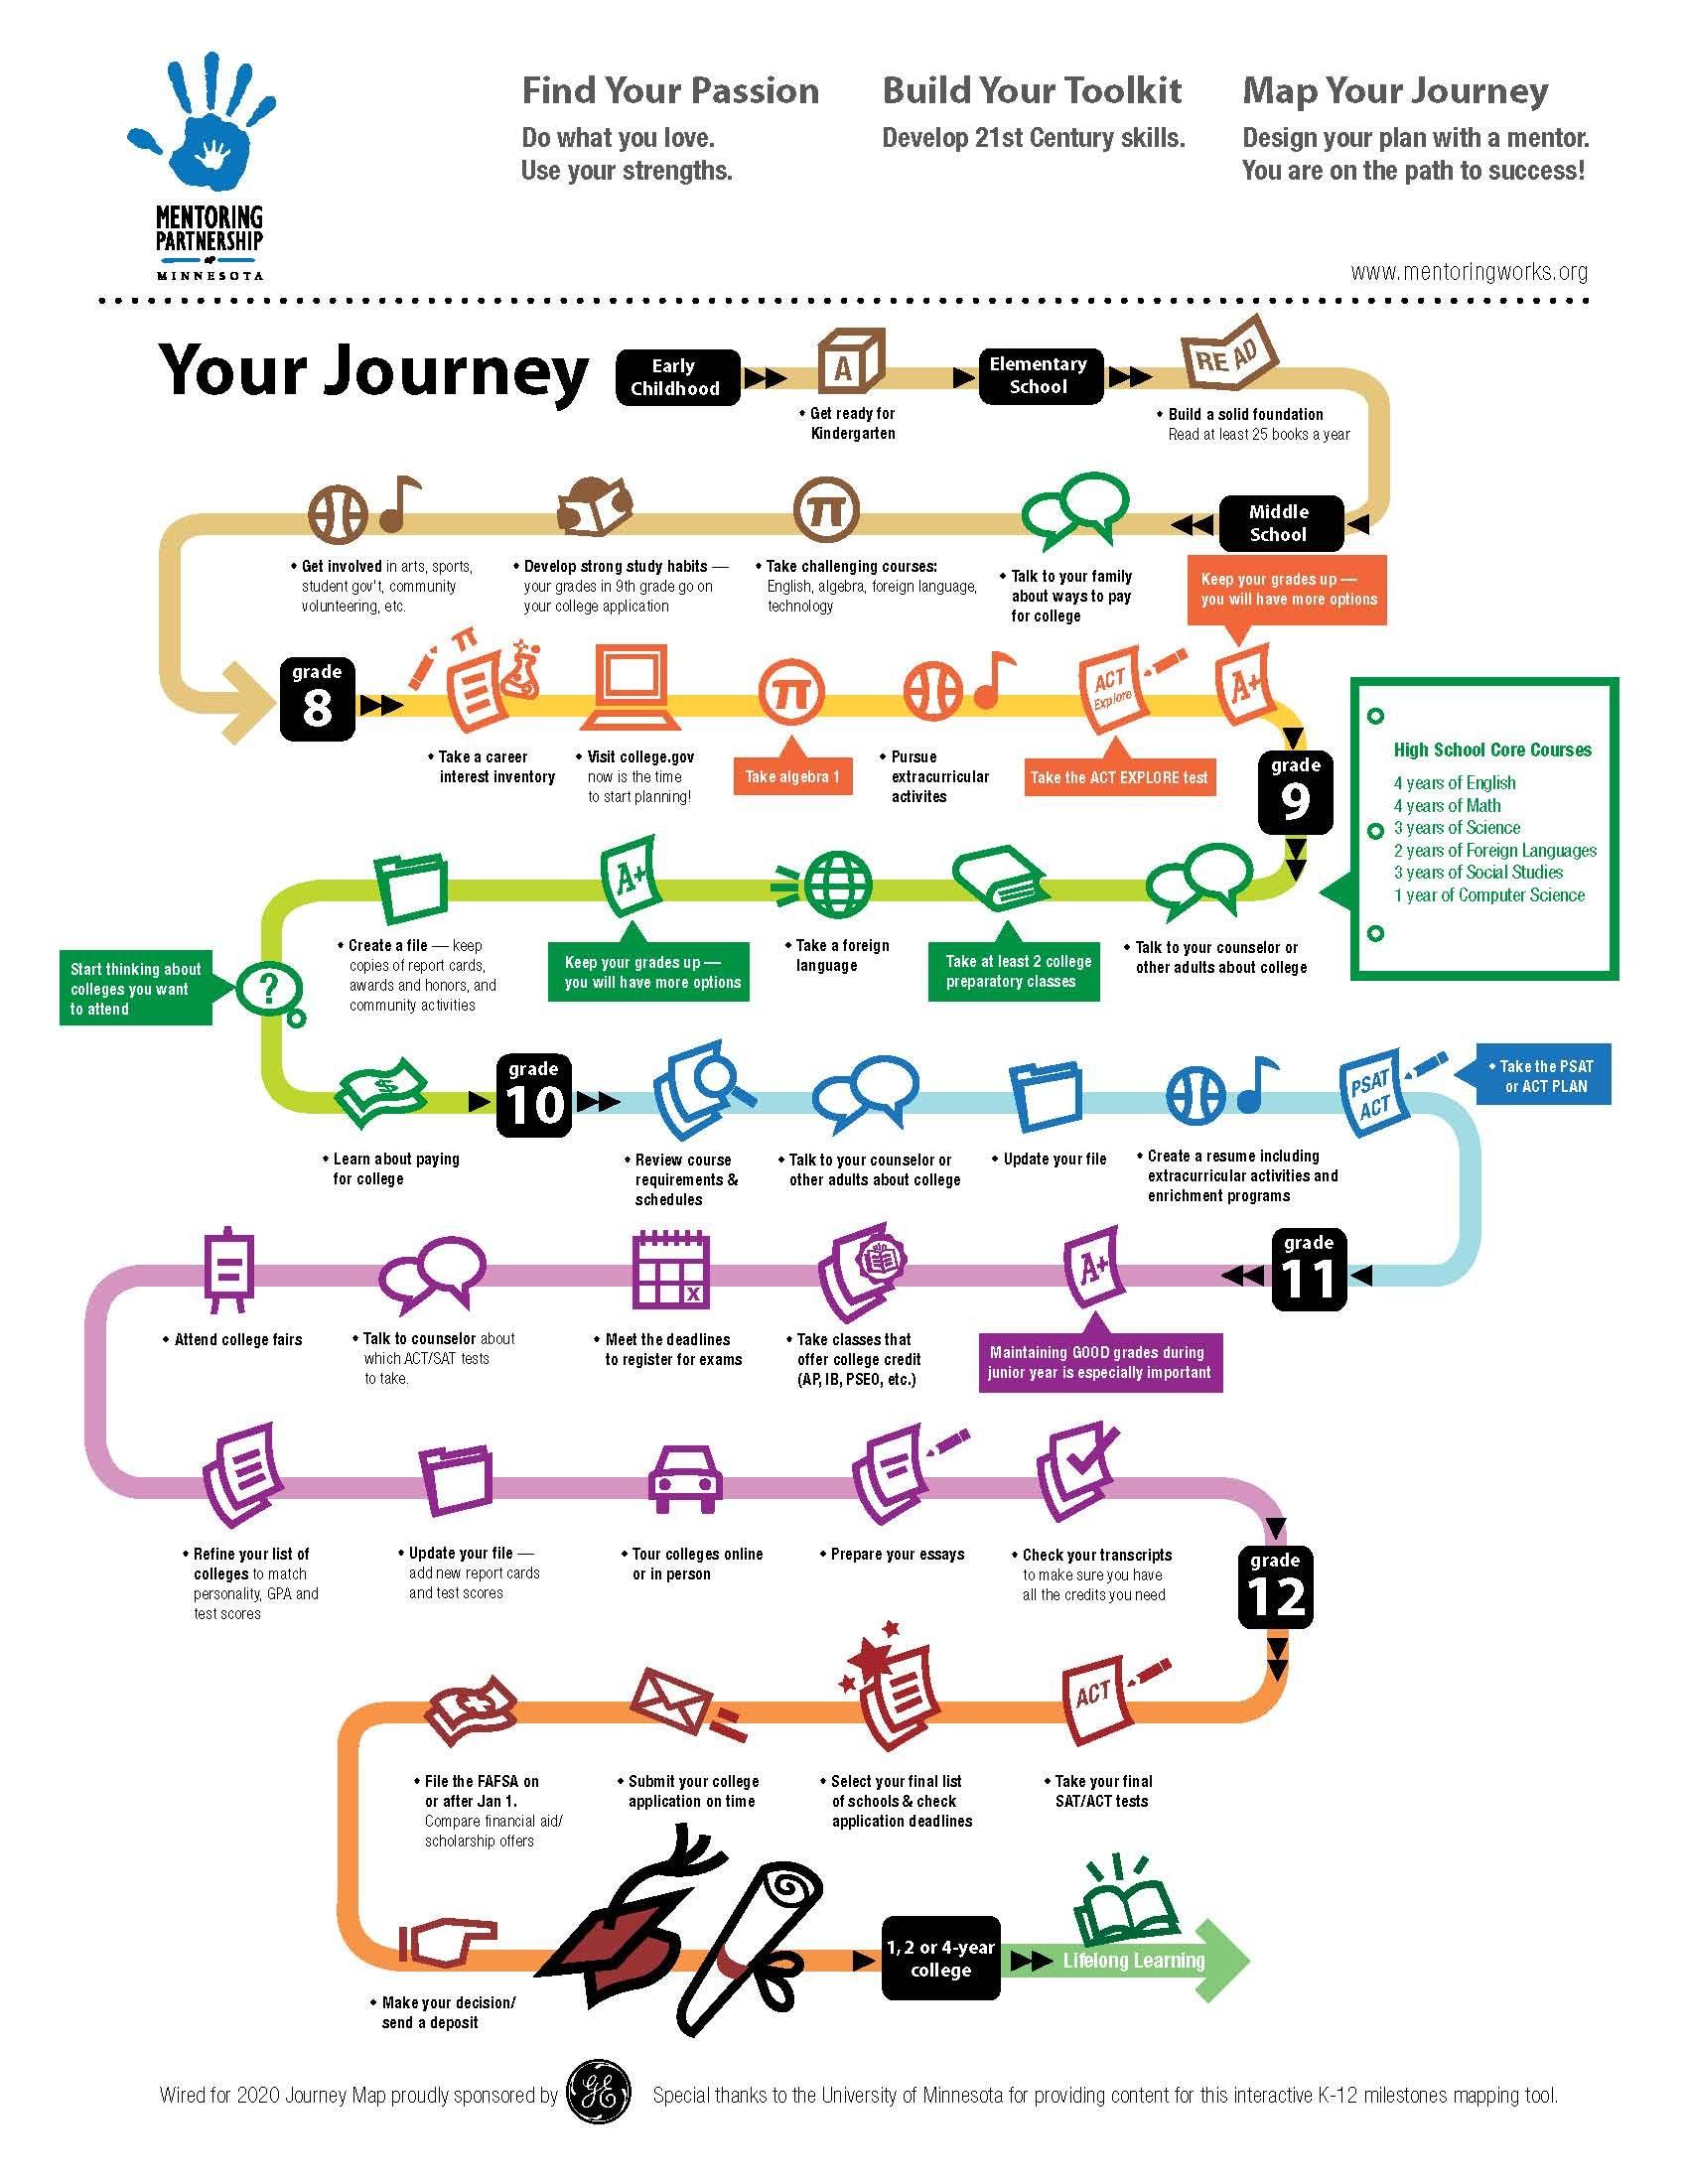 Sephora Map : sephora, Wired, Future, Journey, Mapping,, Customer, Thinking